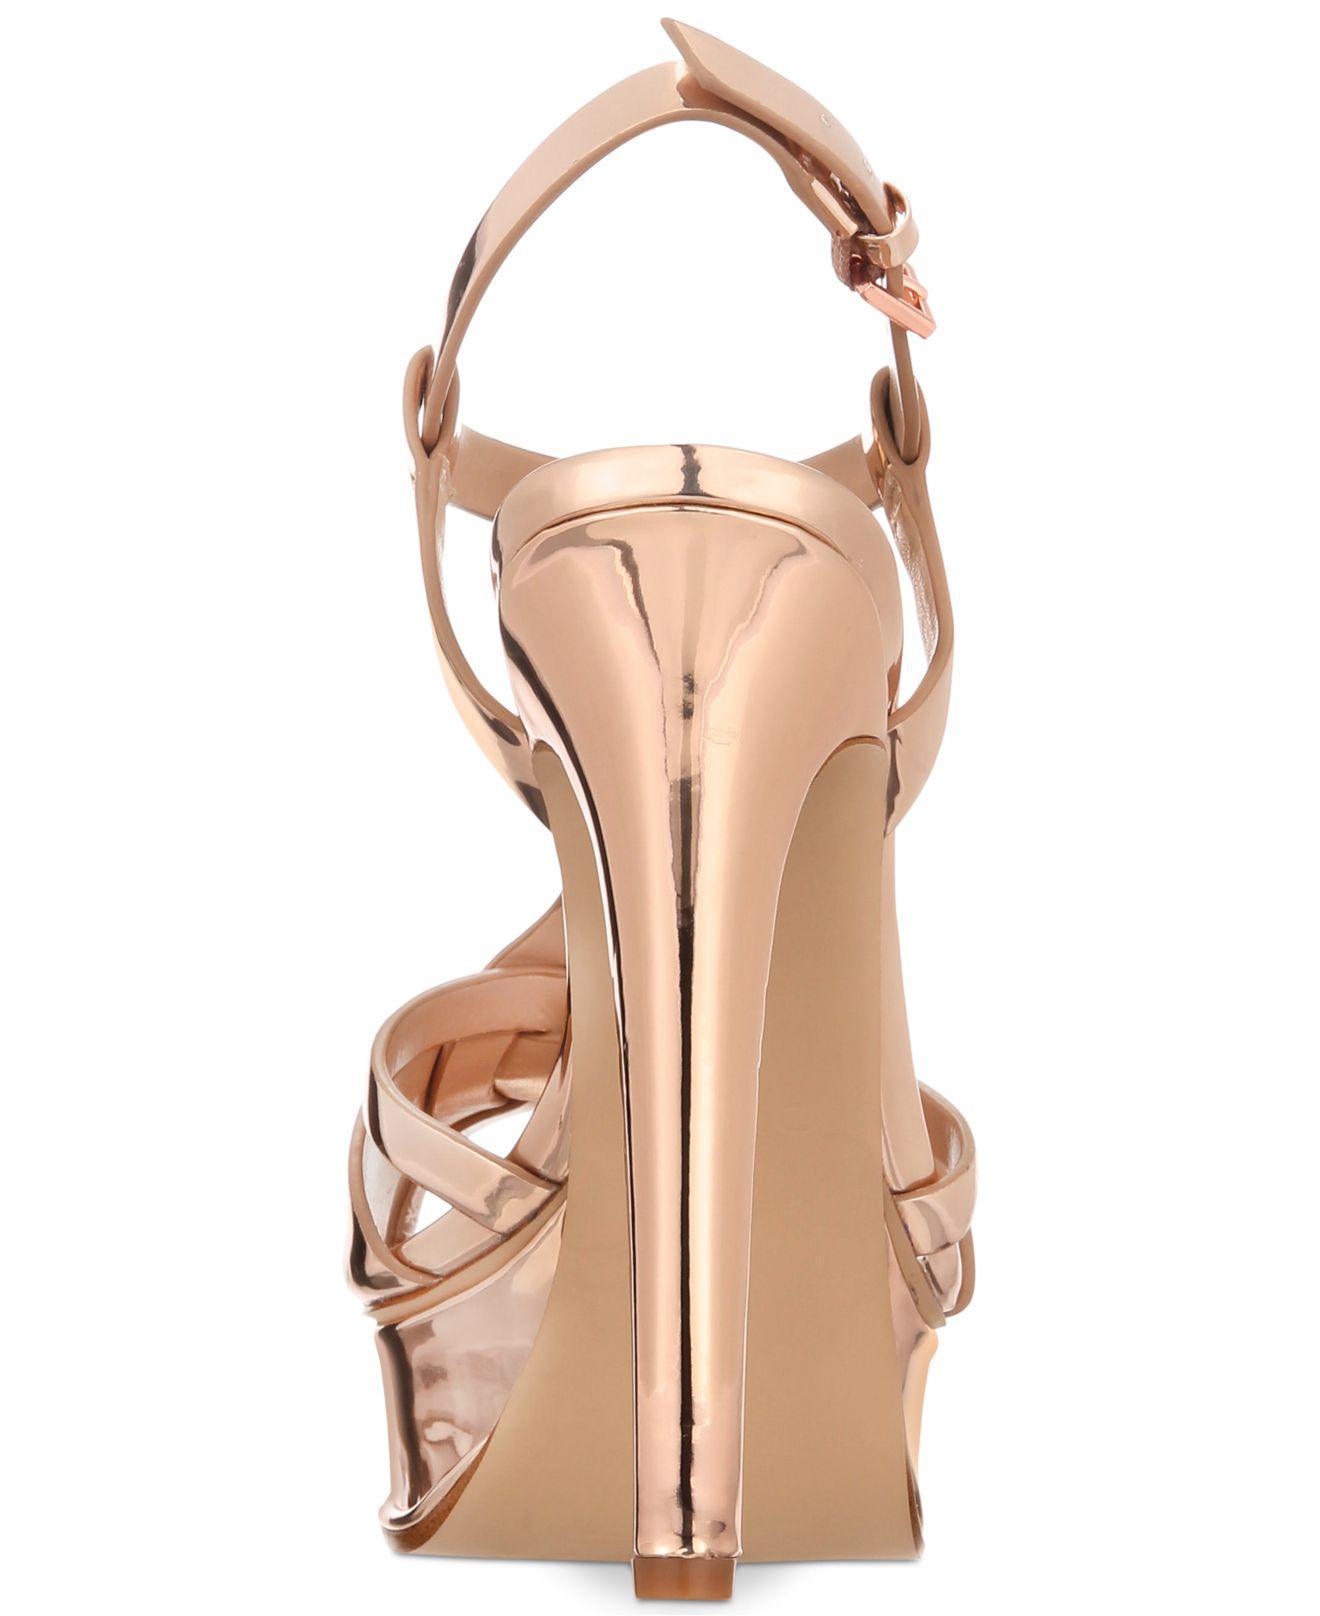 ALDO Chelly Platform Dress Sandals - Lyst